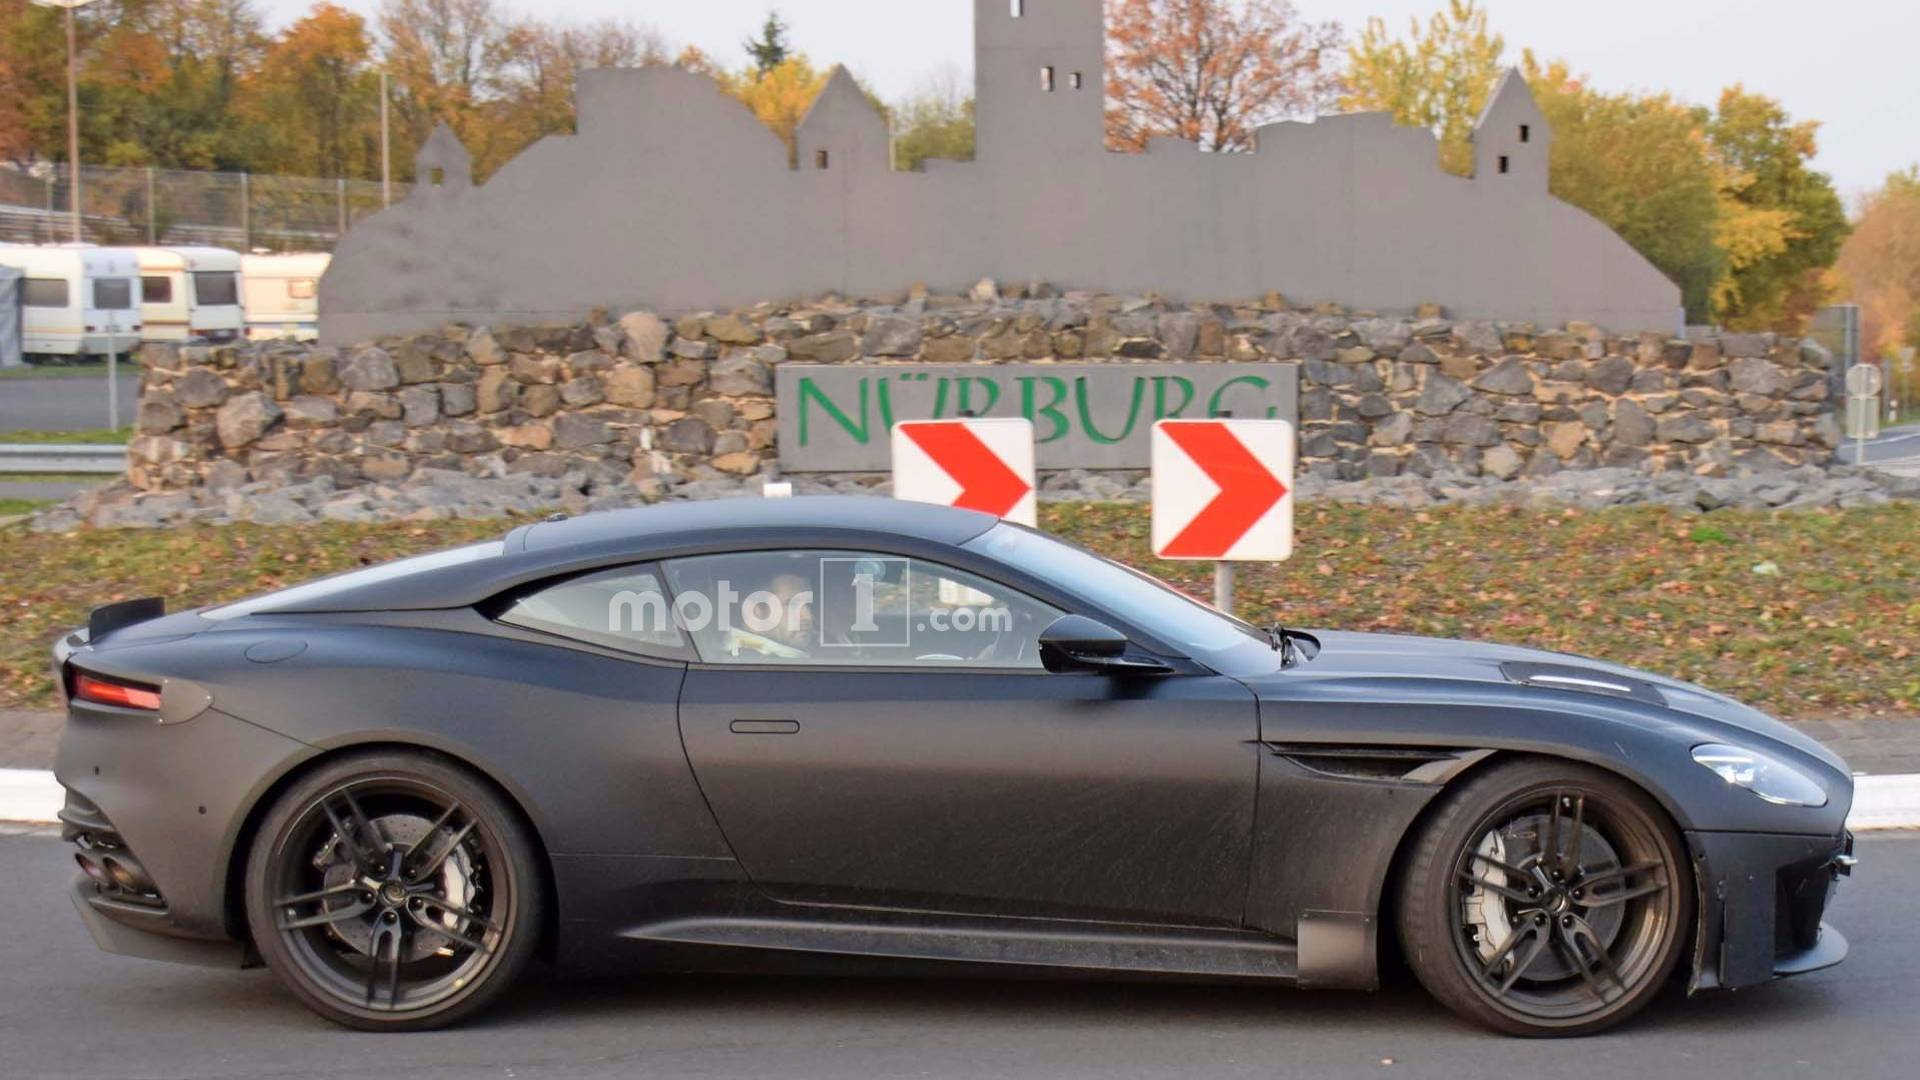 2019 aston martin vanquish spied looking mean at nürburgring